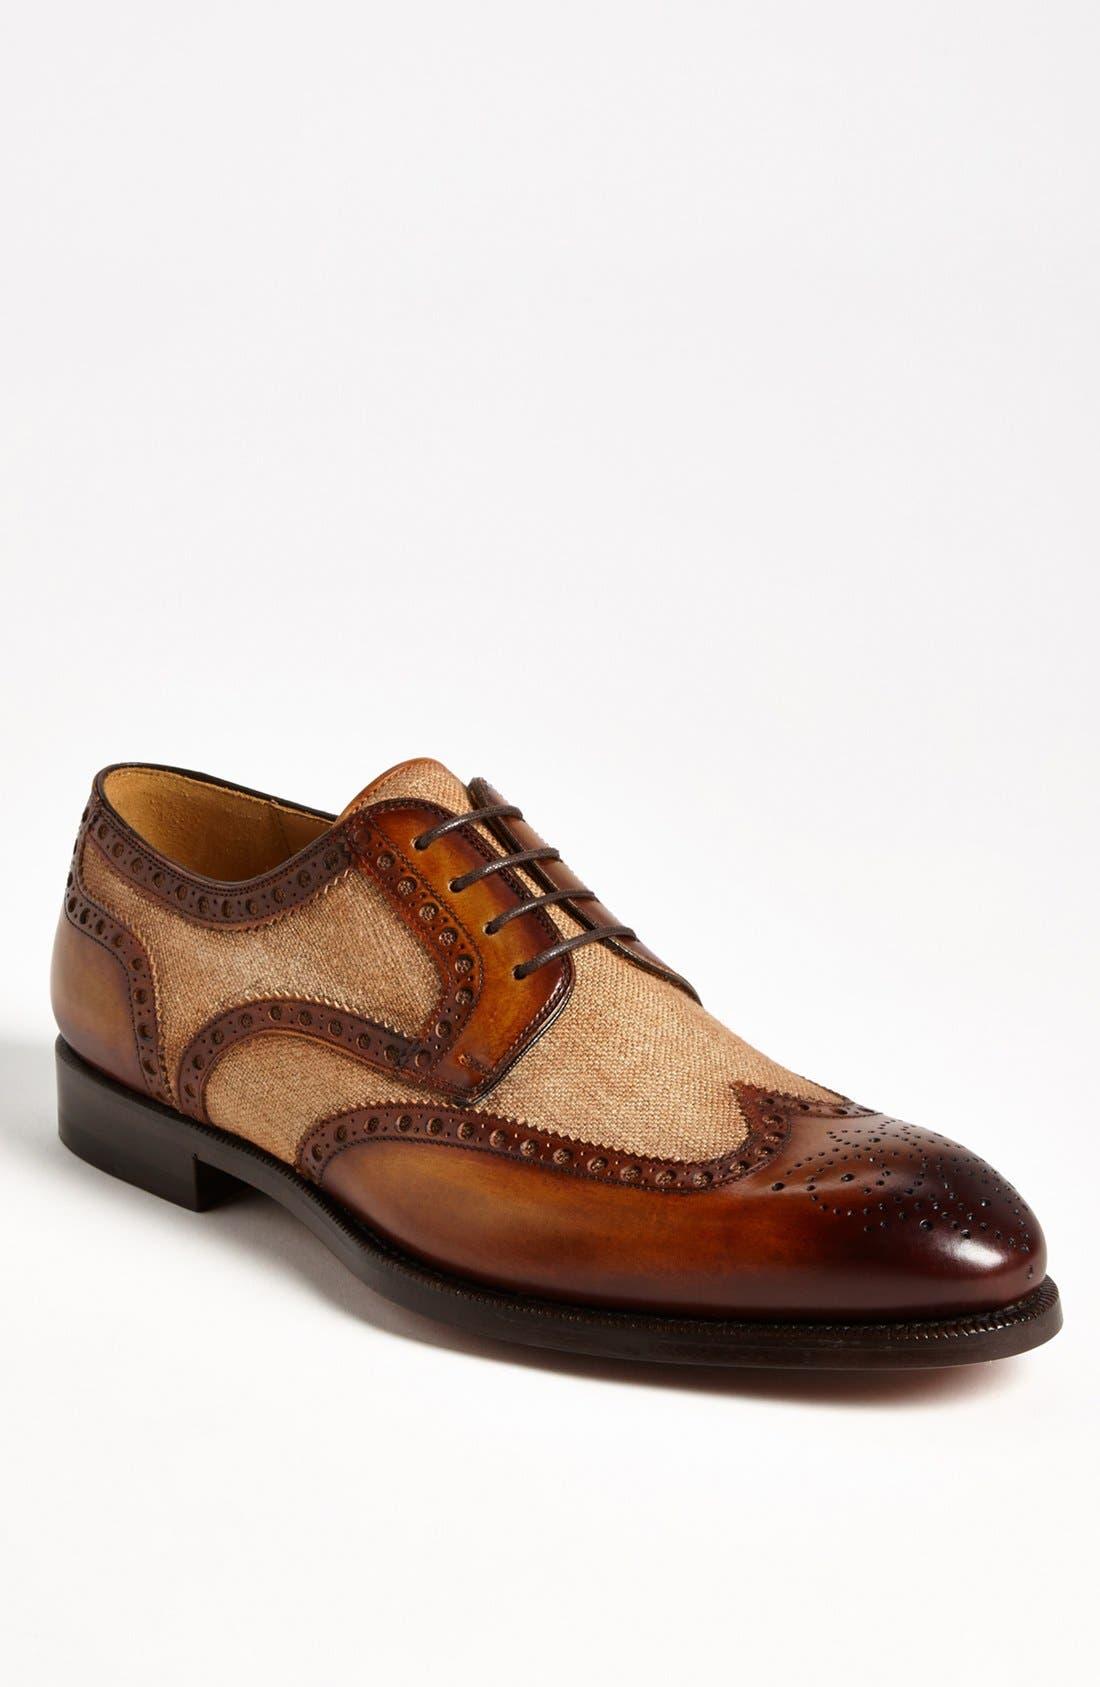 Alternate Image 1 Selected - Magnanni 'Artea' Spectator Shoe